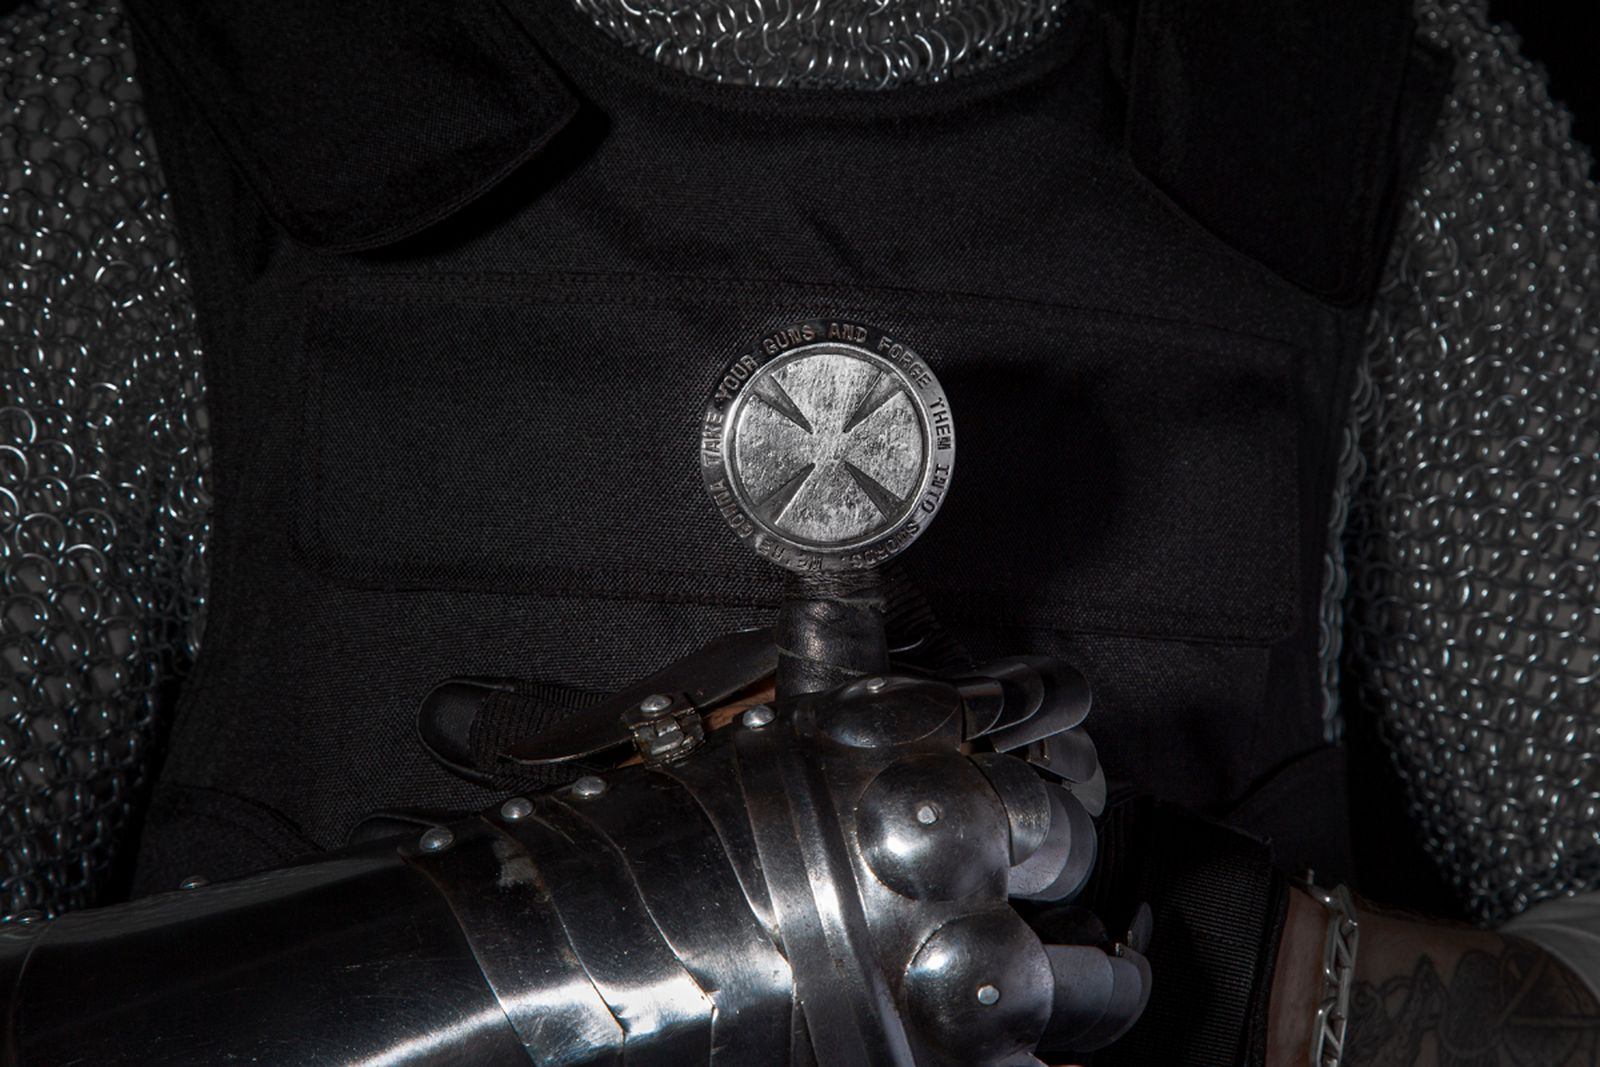 mschf guns 2 swords buyback trade-in program grimes met gala outfit